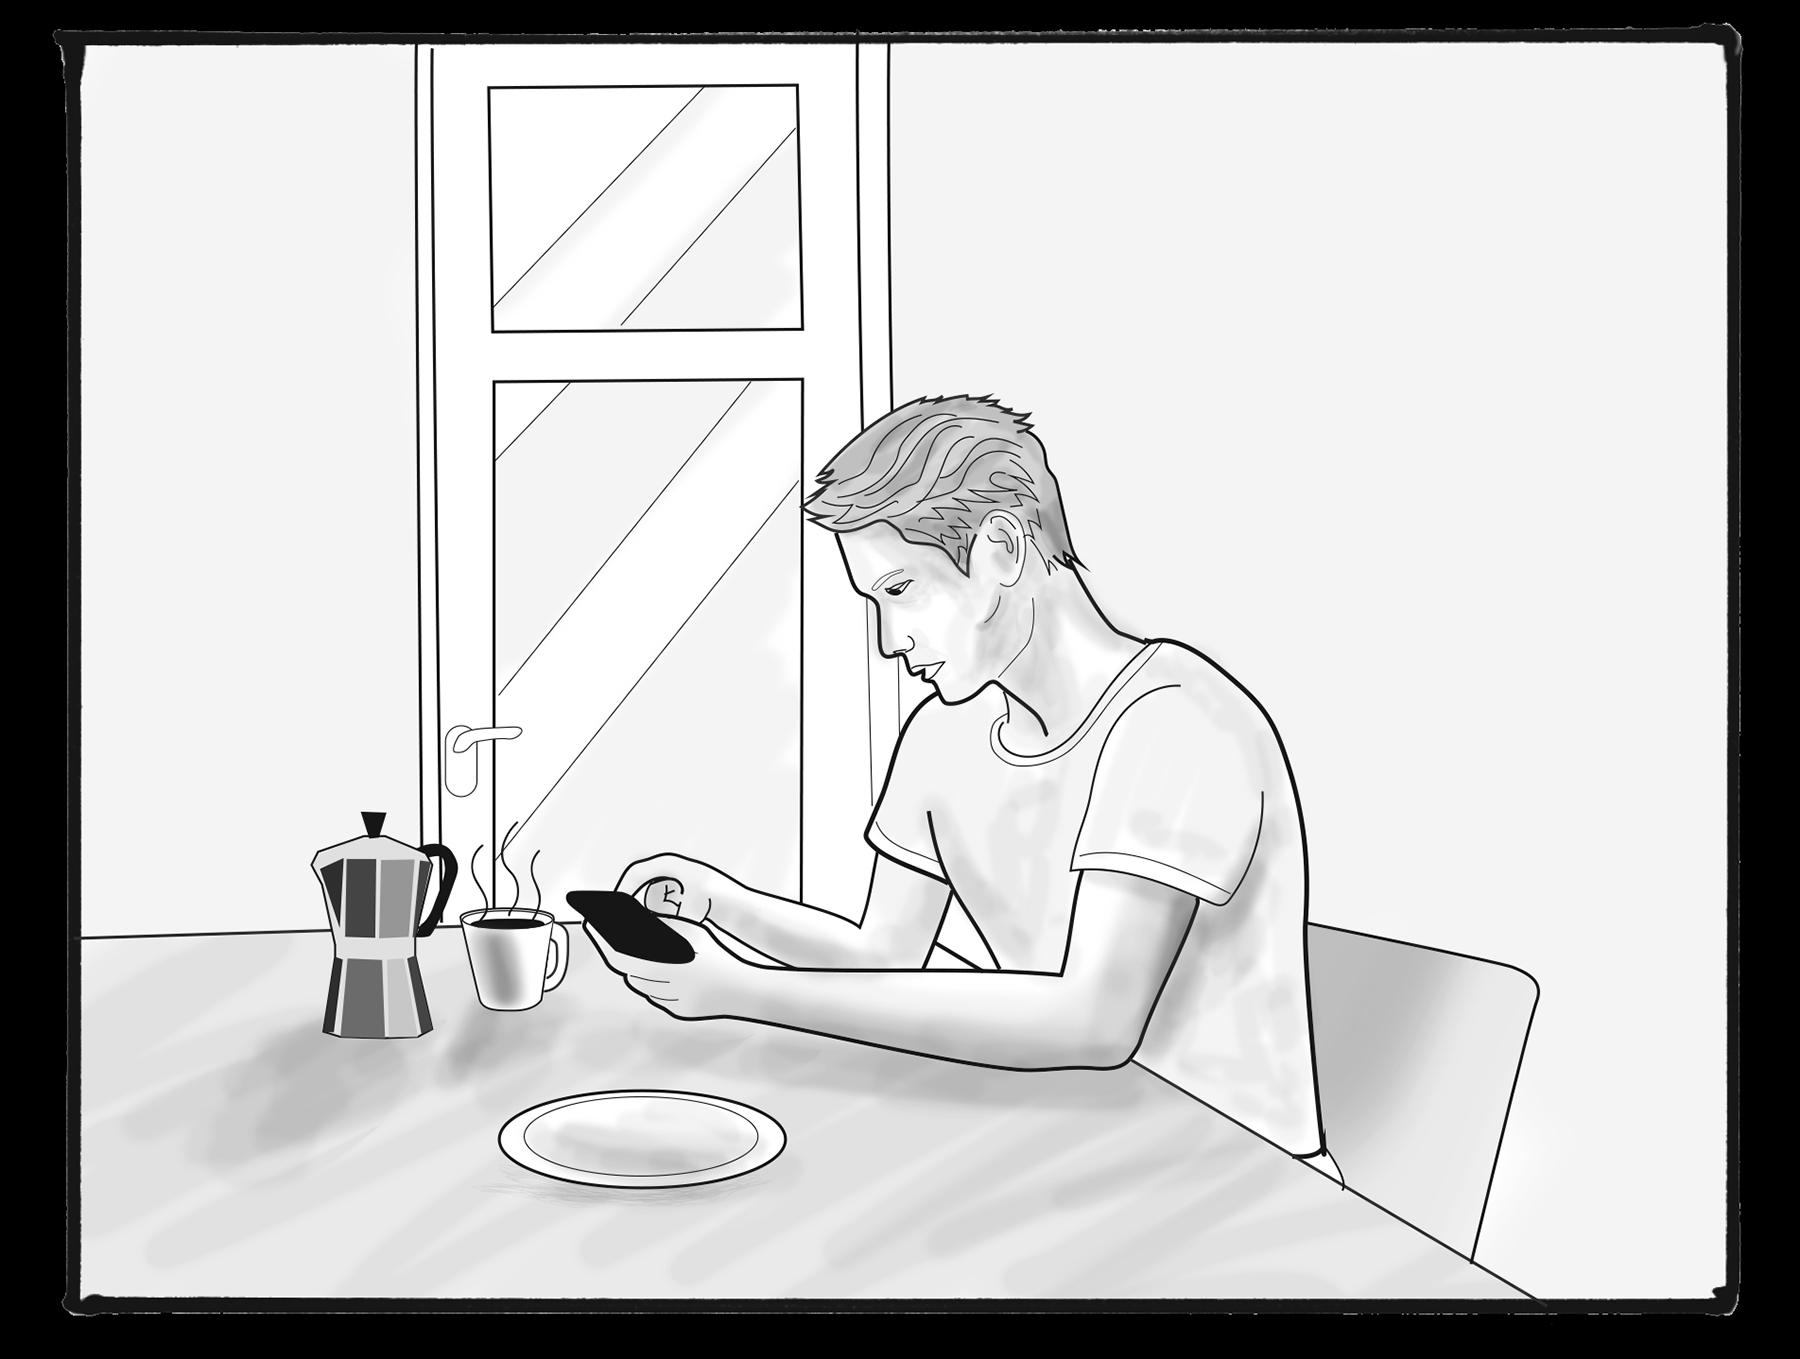 Storyboard_Sketch_5b.jpg